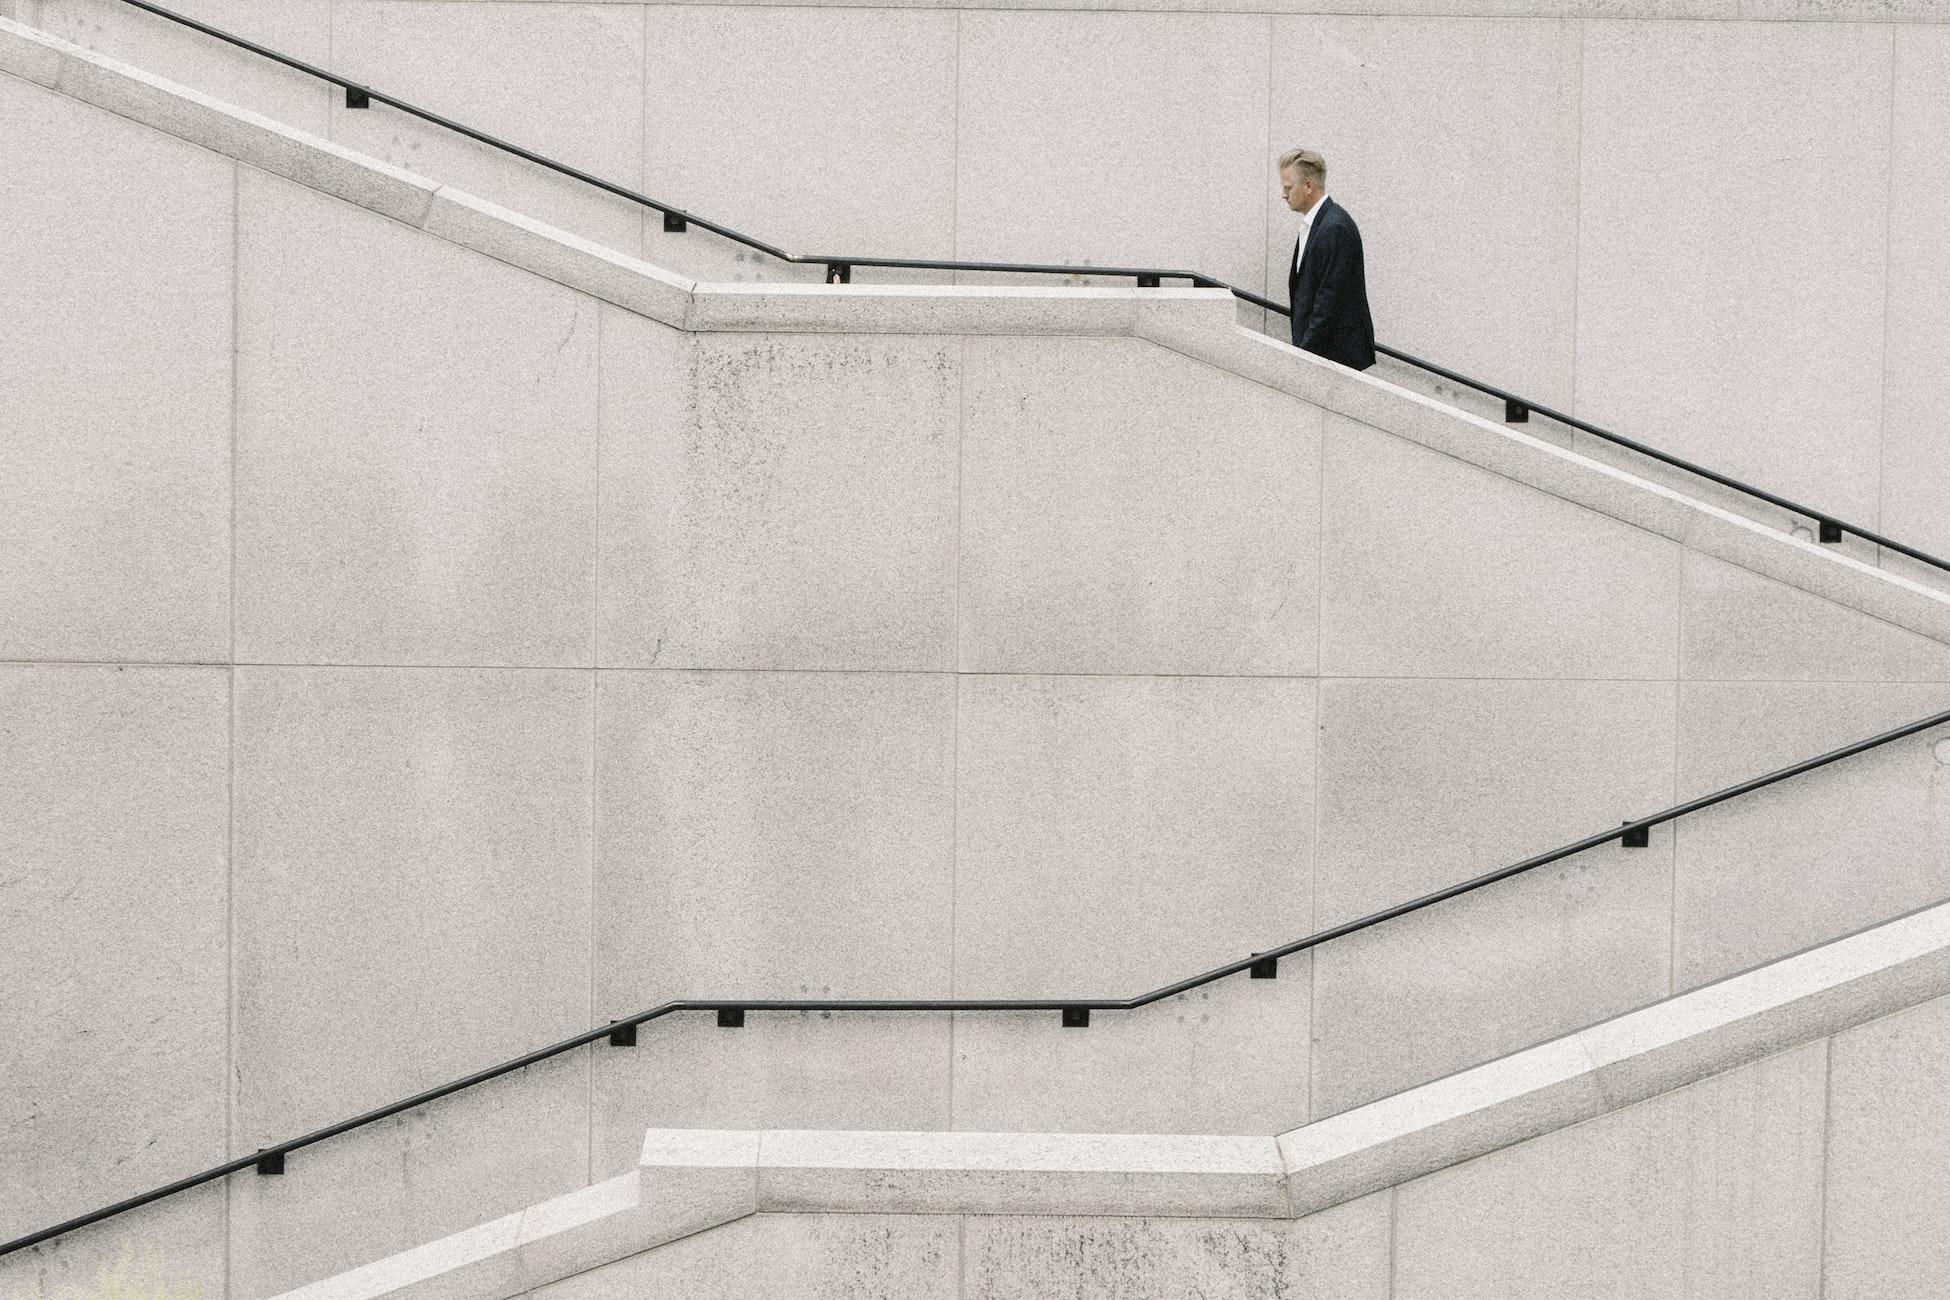 Man walking up concrete staircase